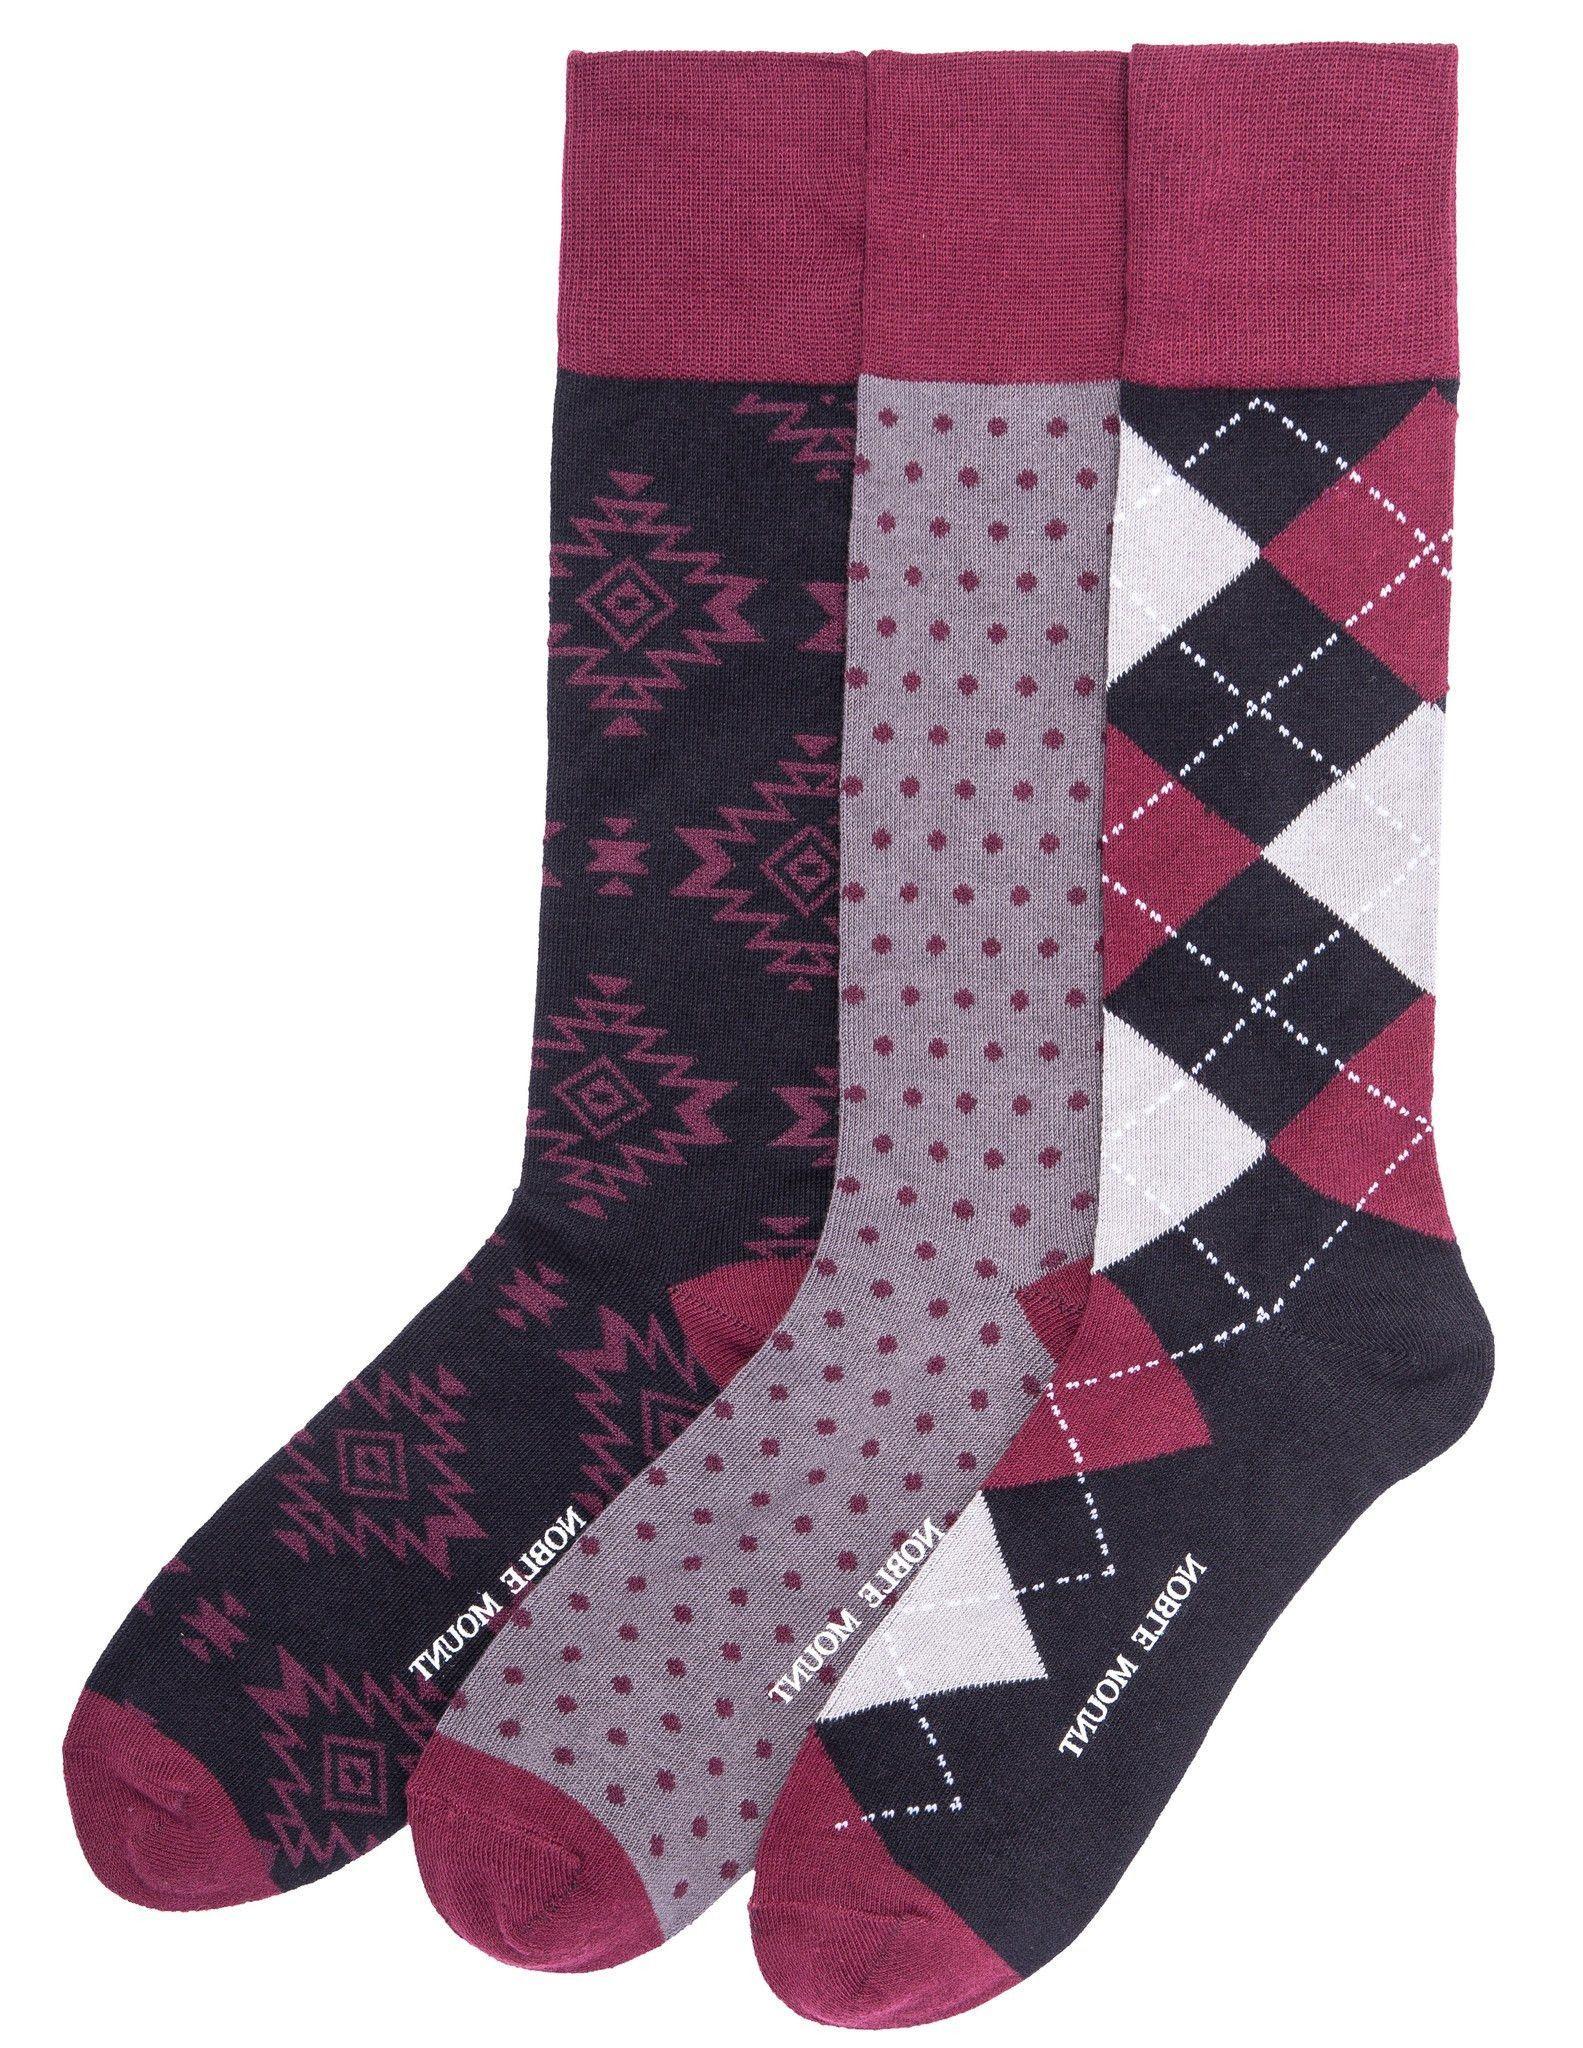 Men S Combed Cotton Dress Socks 3 Pack Combed Cotton Dress Dress Socks Combed Cotton [ 2048 x 1583 Pixel ]